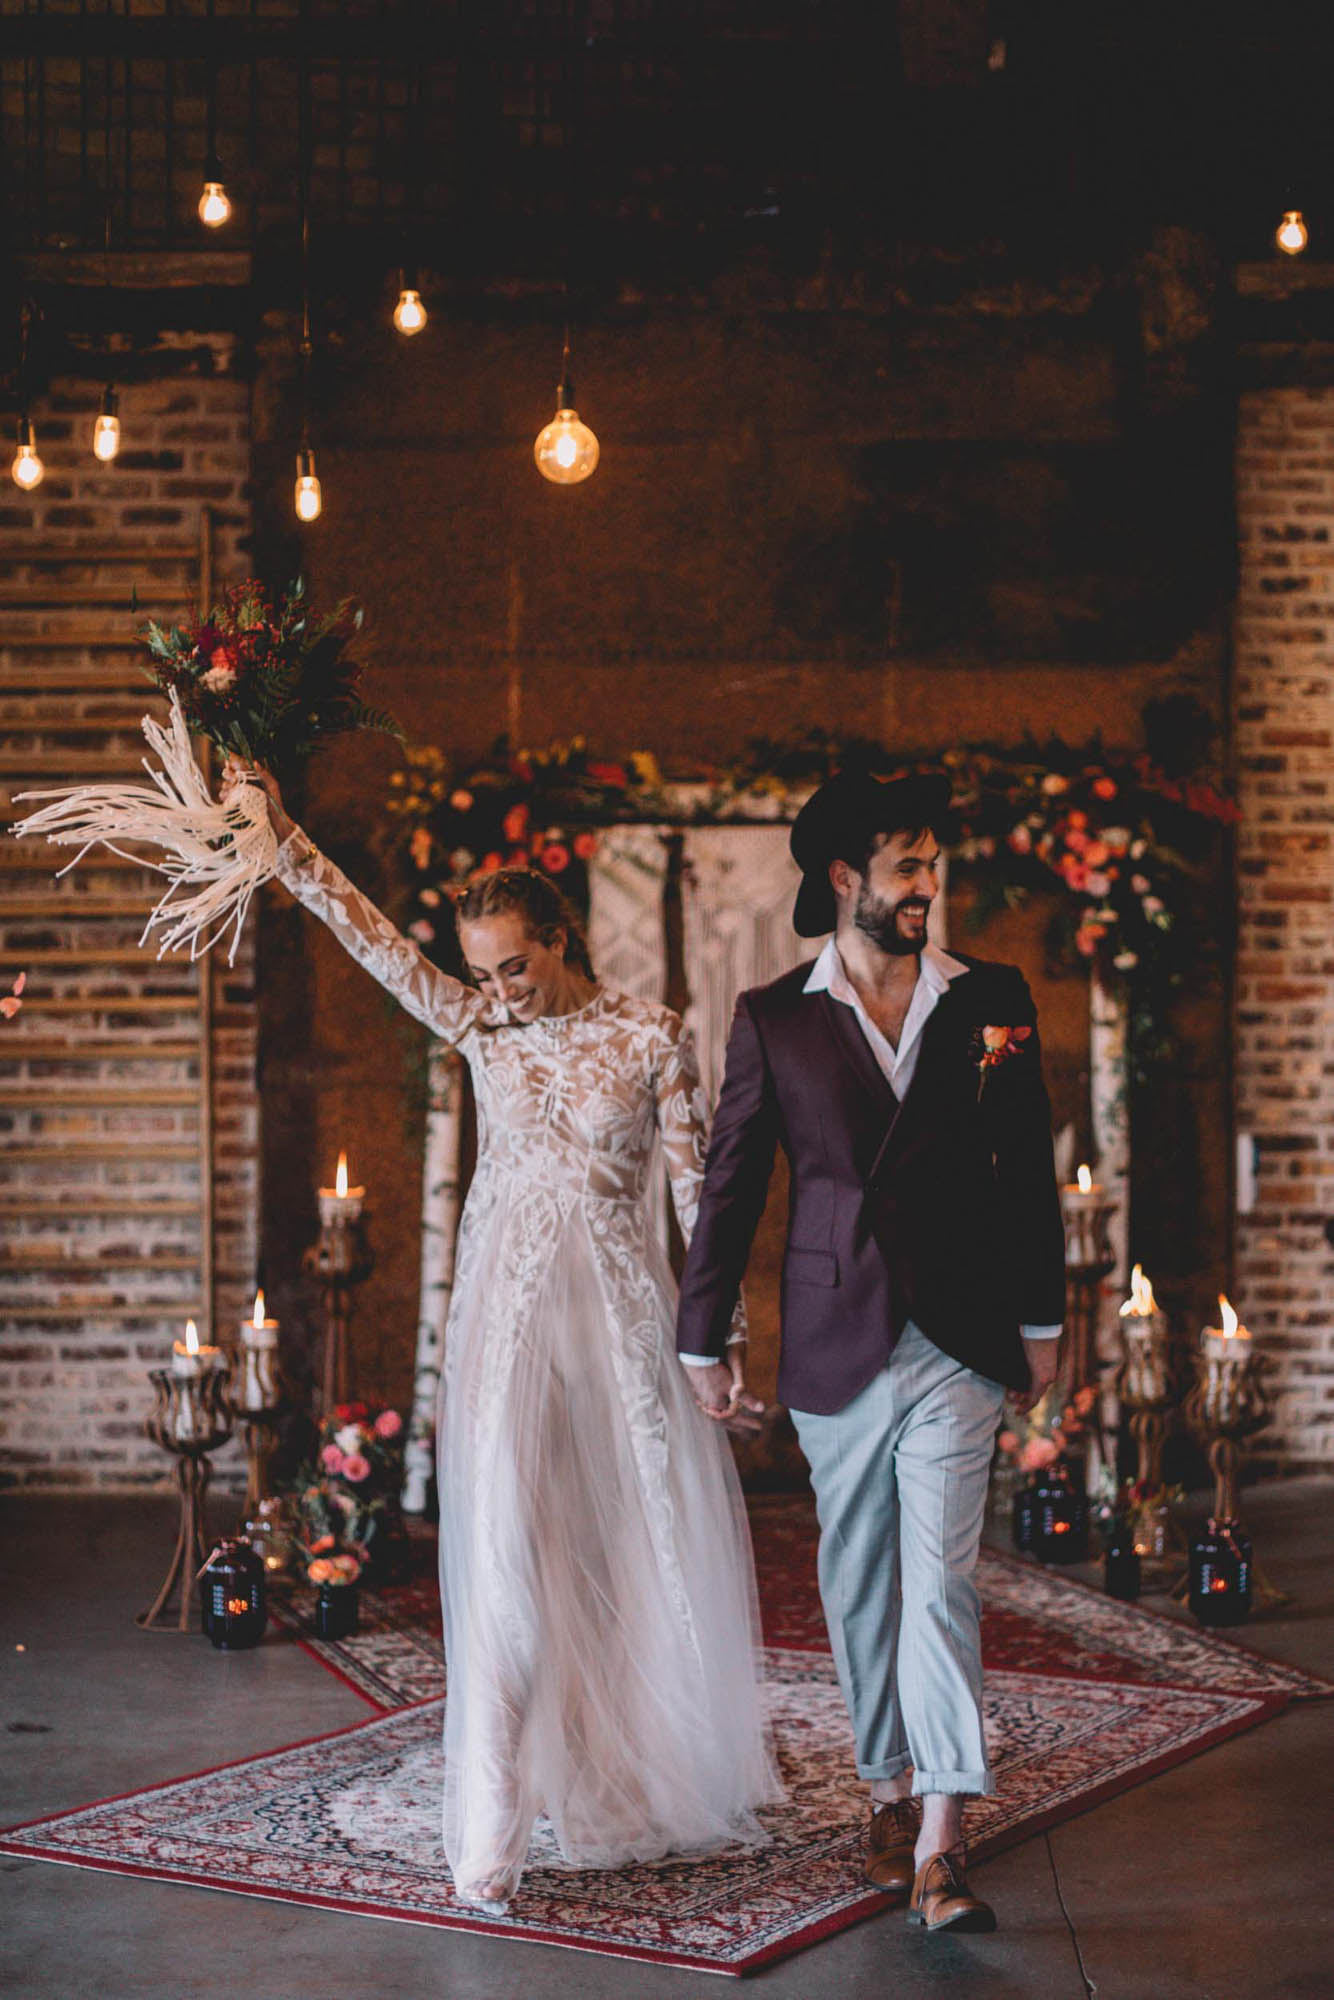 COACHELLA_LES BONNES JOIES_PHOTOGRAPHE_MARIAGE_LES BANDITS-9